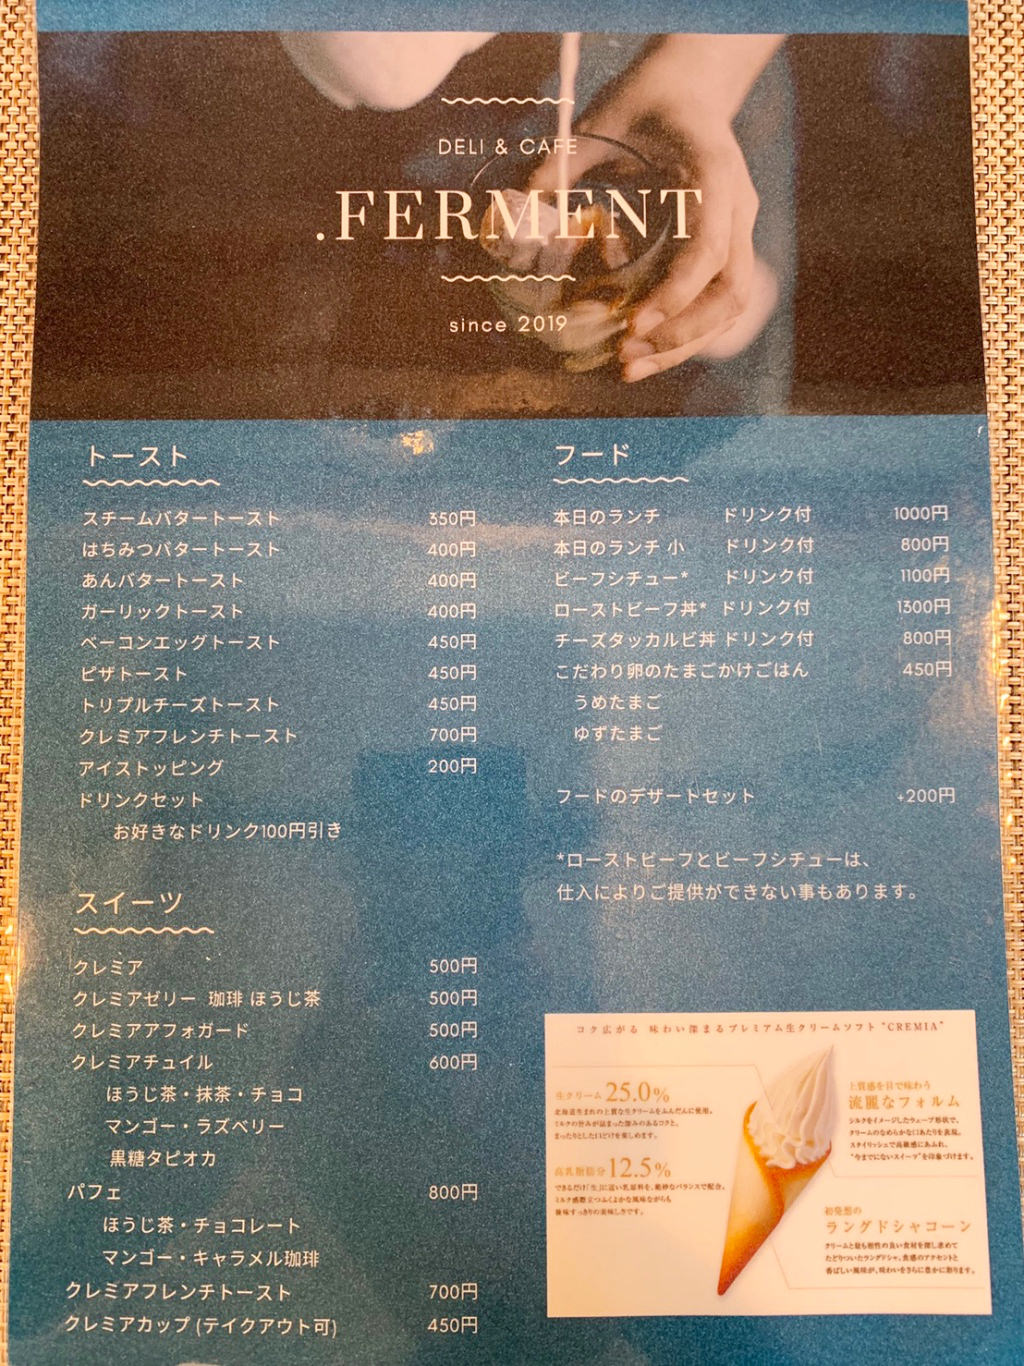 FERMENT(ファーメント)のメニュー